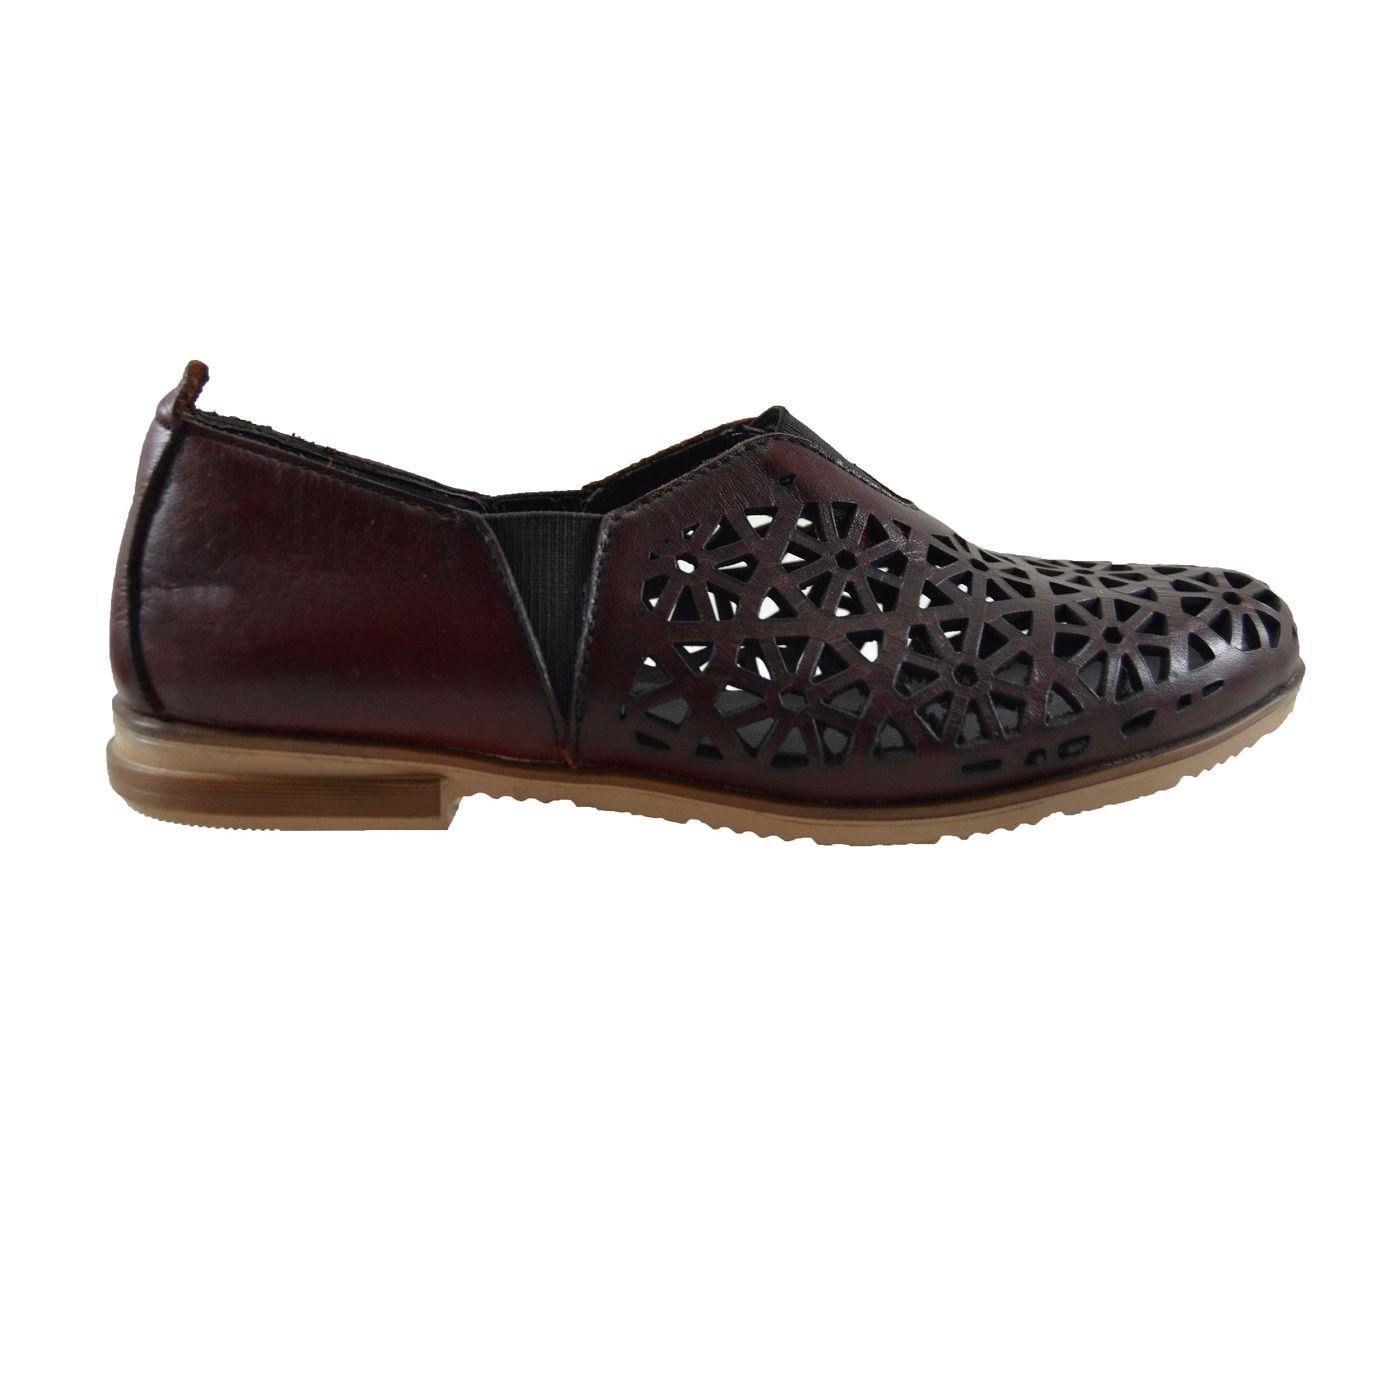 کفش زنانه کد 519 -  - 2